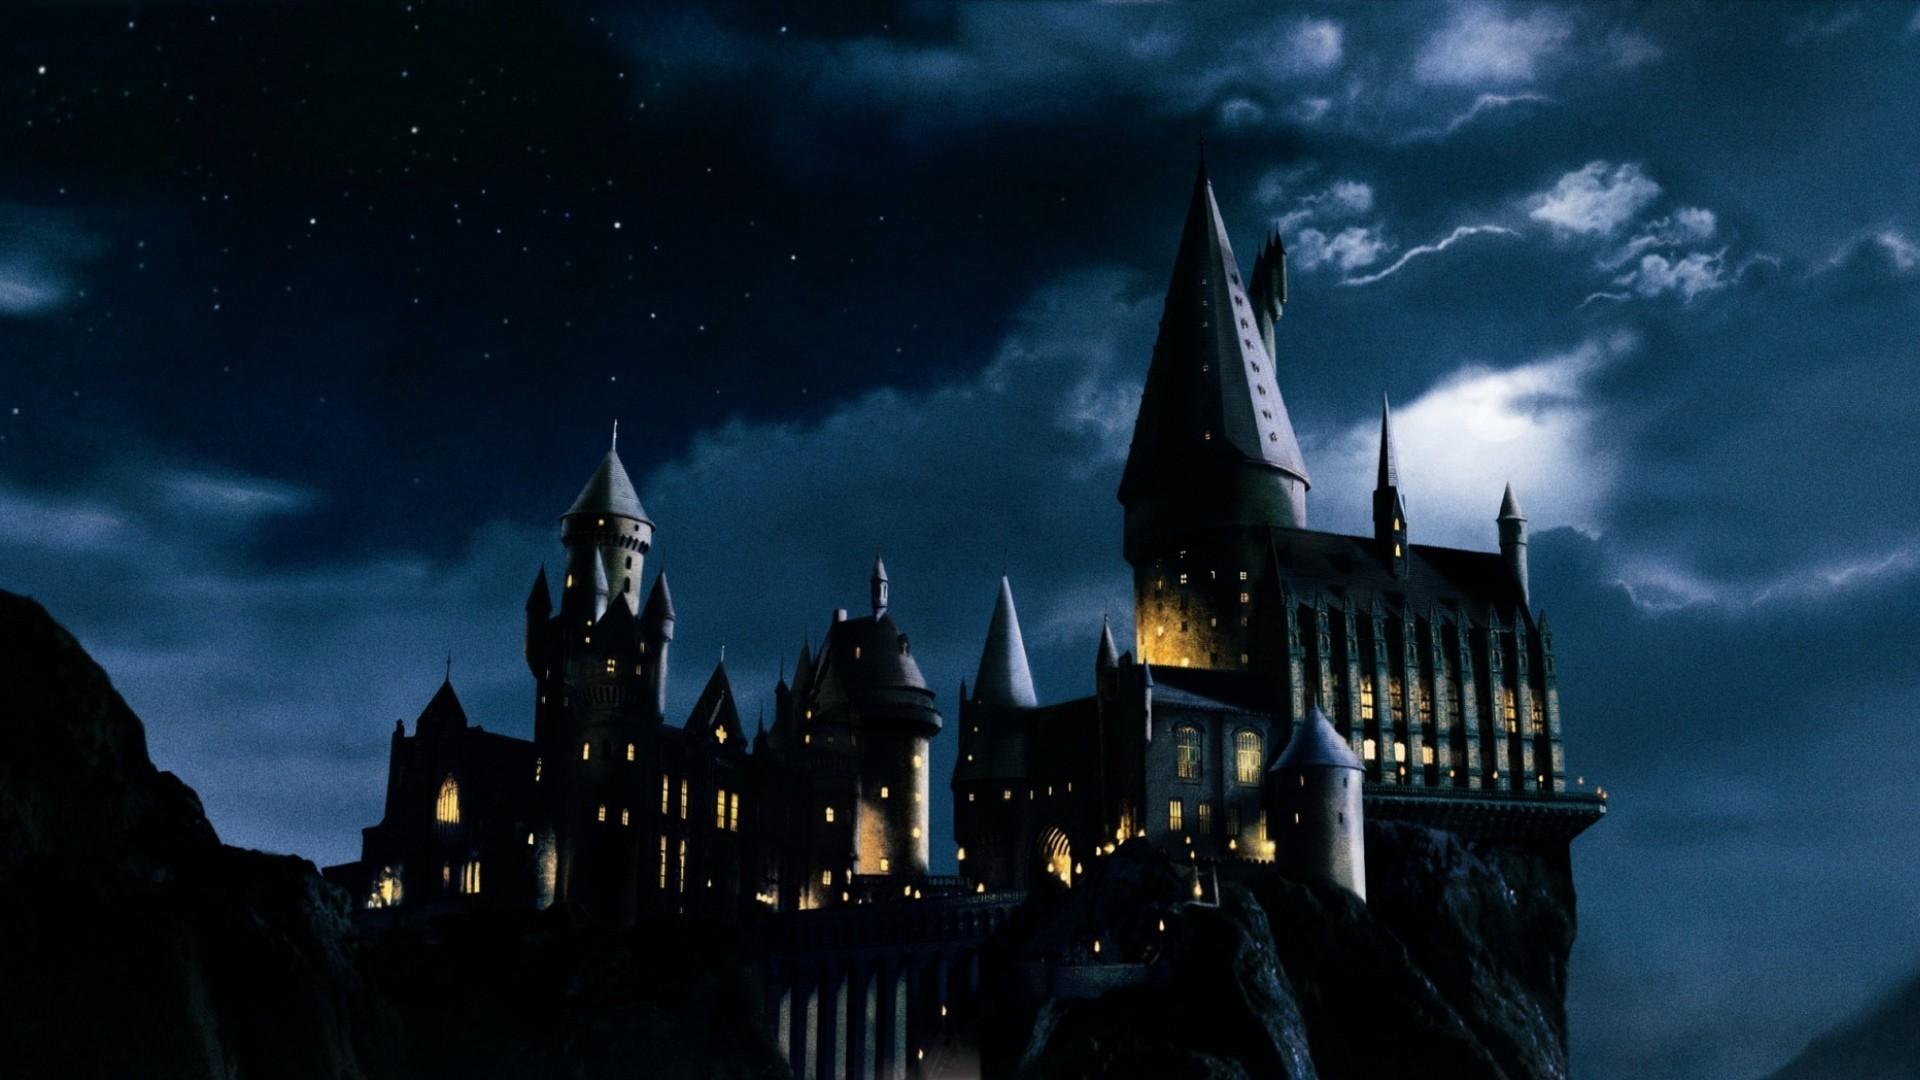 Most Inspiring Wallpaper Harry Potter Apple - 134788-harry-potter-wallpapers-1920x1080-tablet  Photograph_959661.jpg